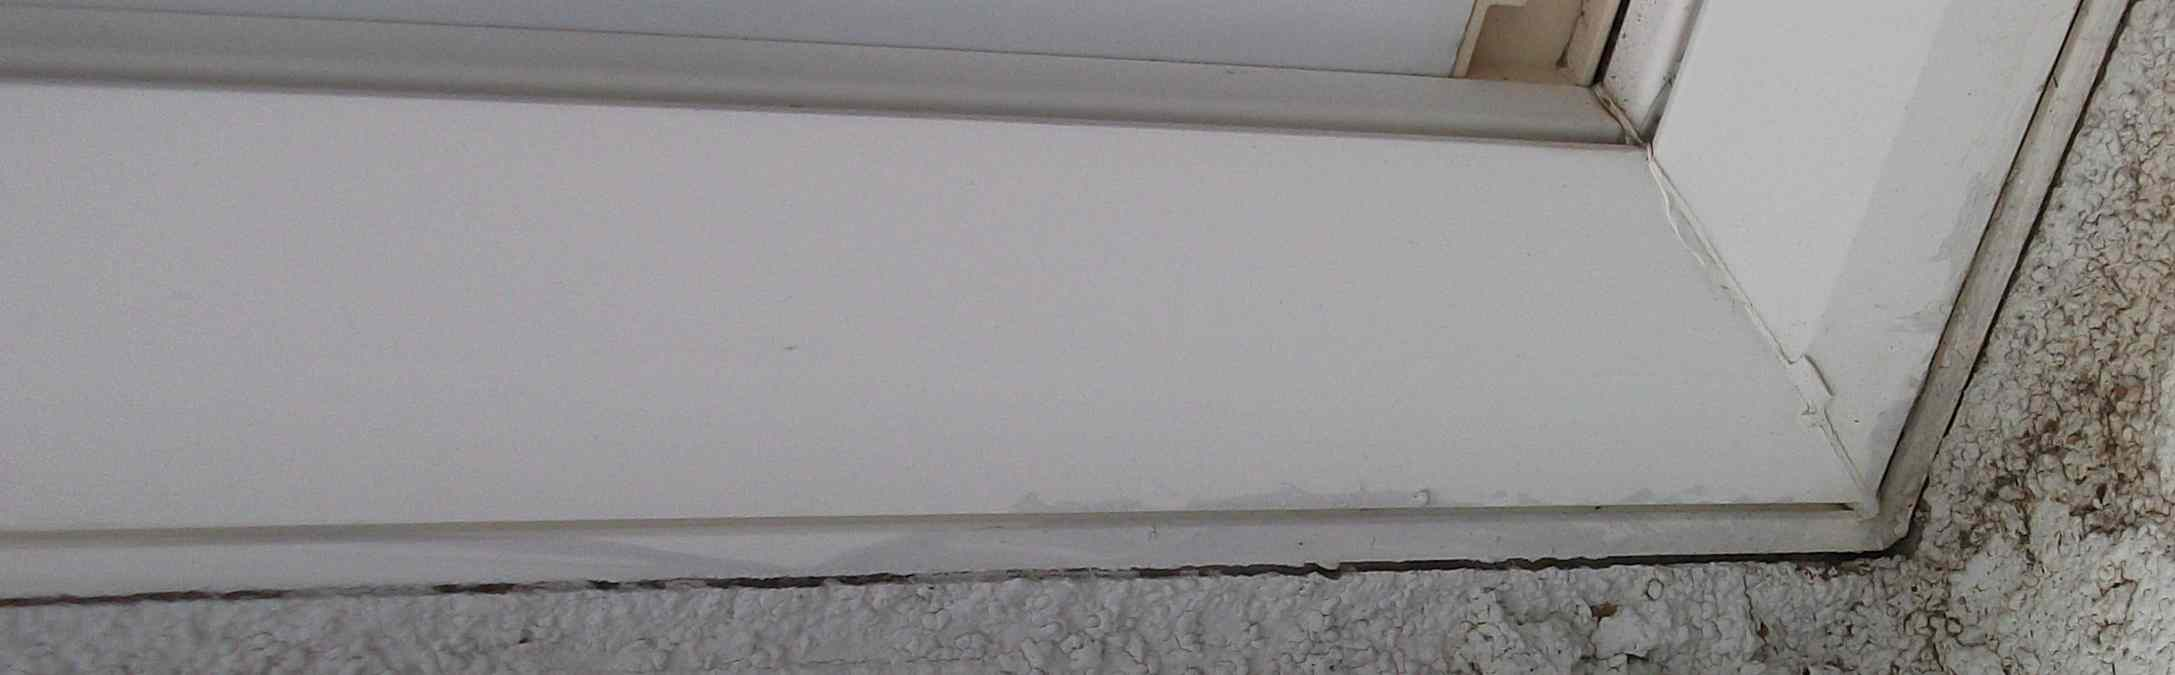 Crack between aluminum window frame and stucco?-windowcrack_sm3.jpg